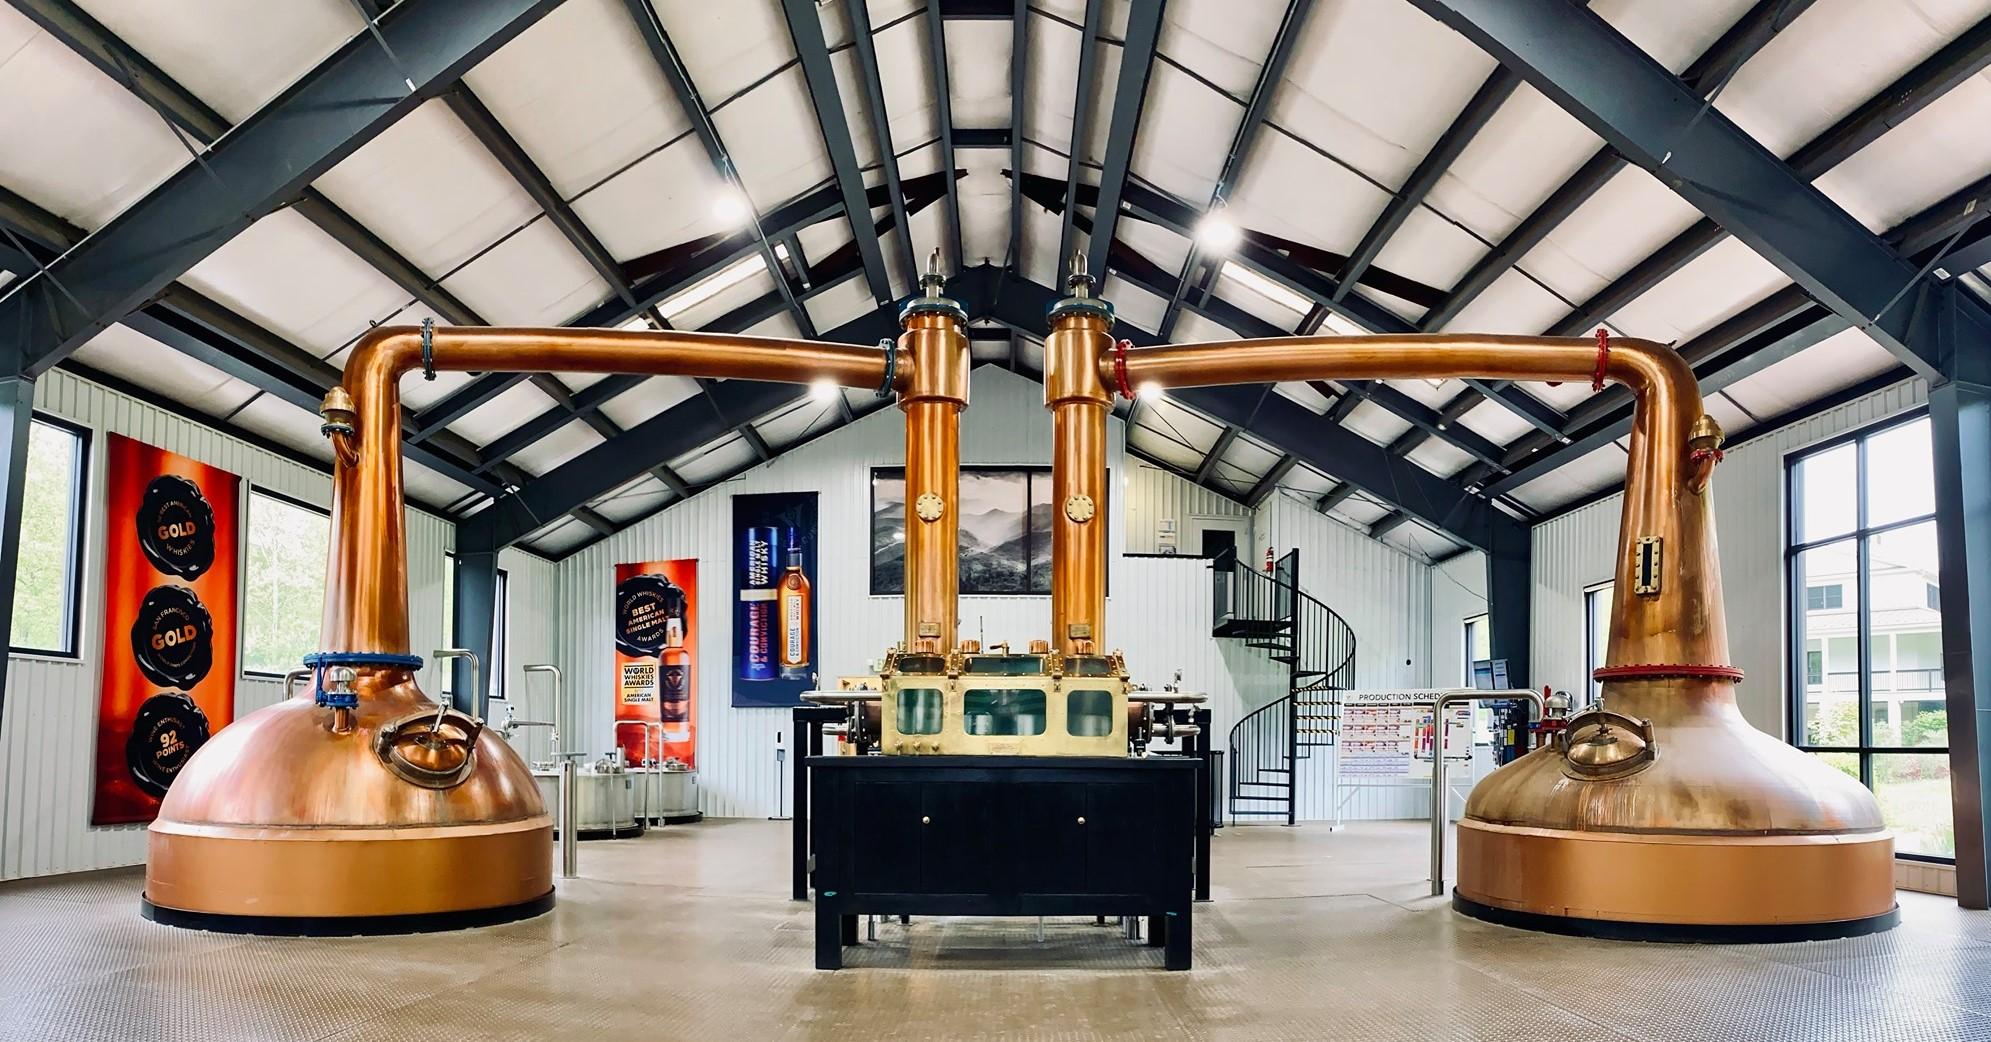 image of copper pot stills courtesy of Virginia Distillery Co.